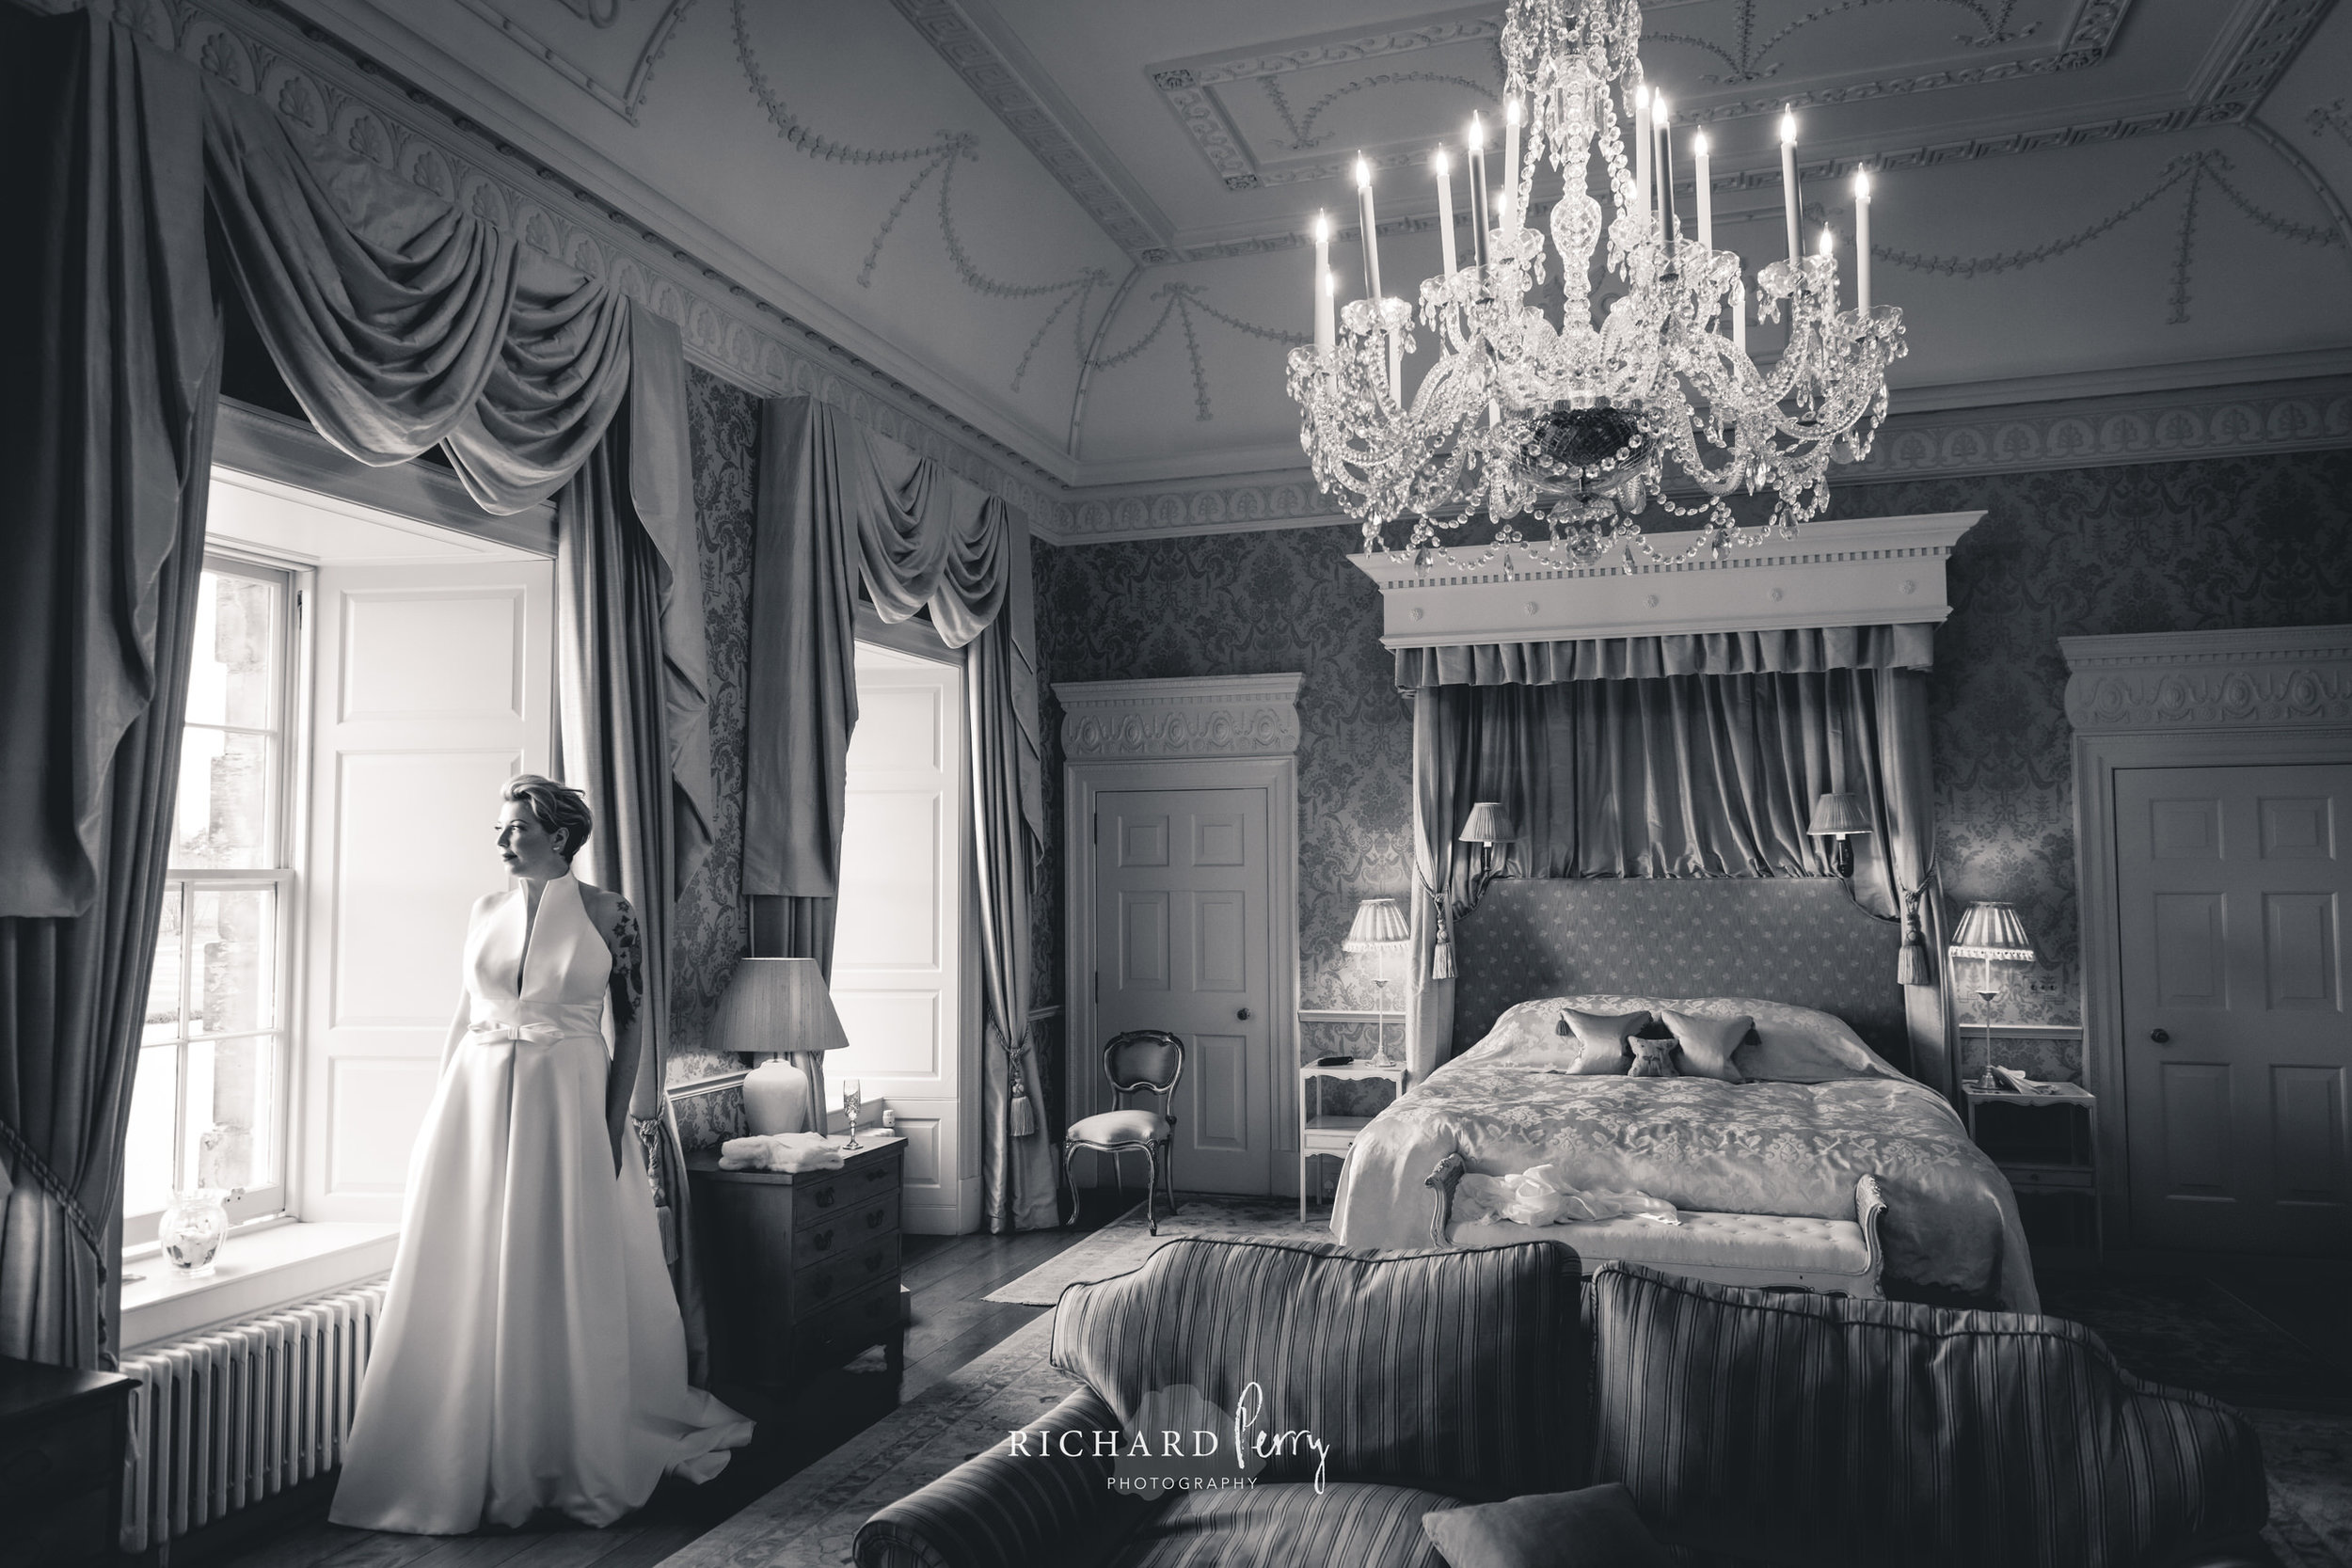 yorkshire-wedding-photographer-destination-archerfield-house-12.jpg